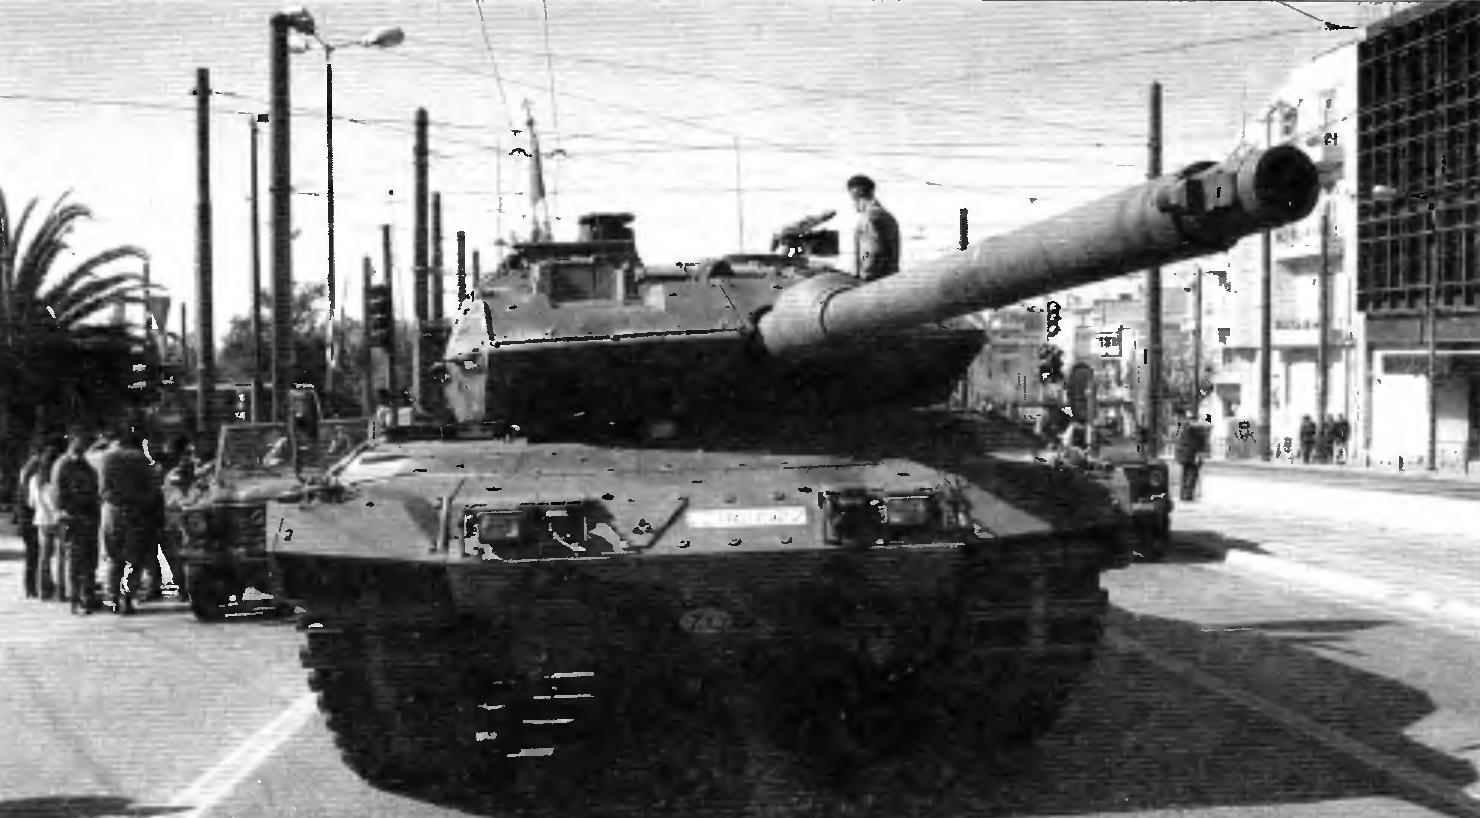 Танк «Леопард» 2HEL (Leopard 2А6) на параде в Афинах в 2008 году